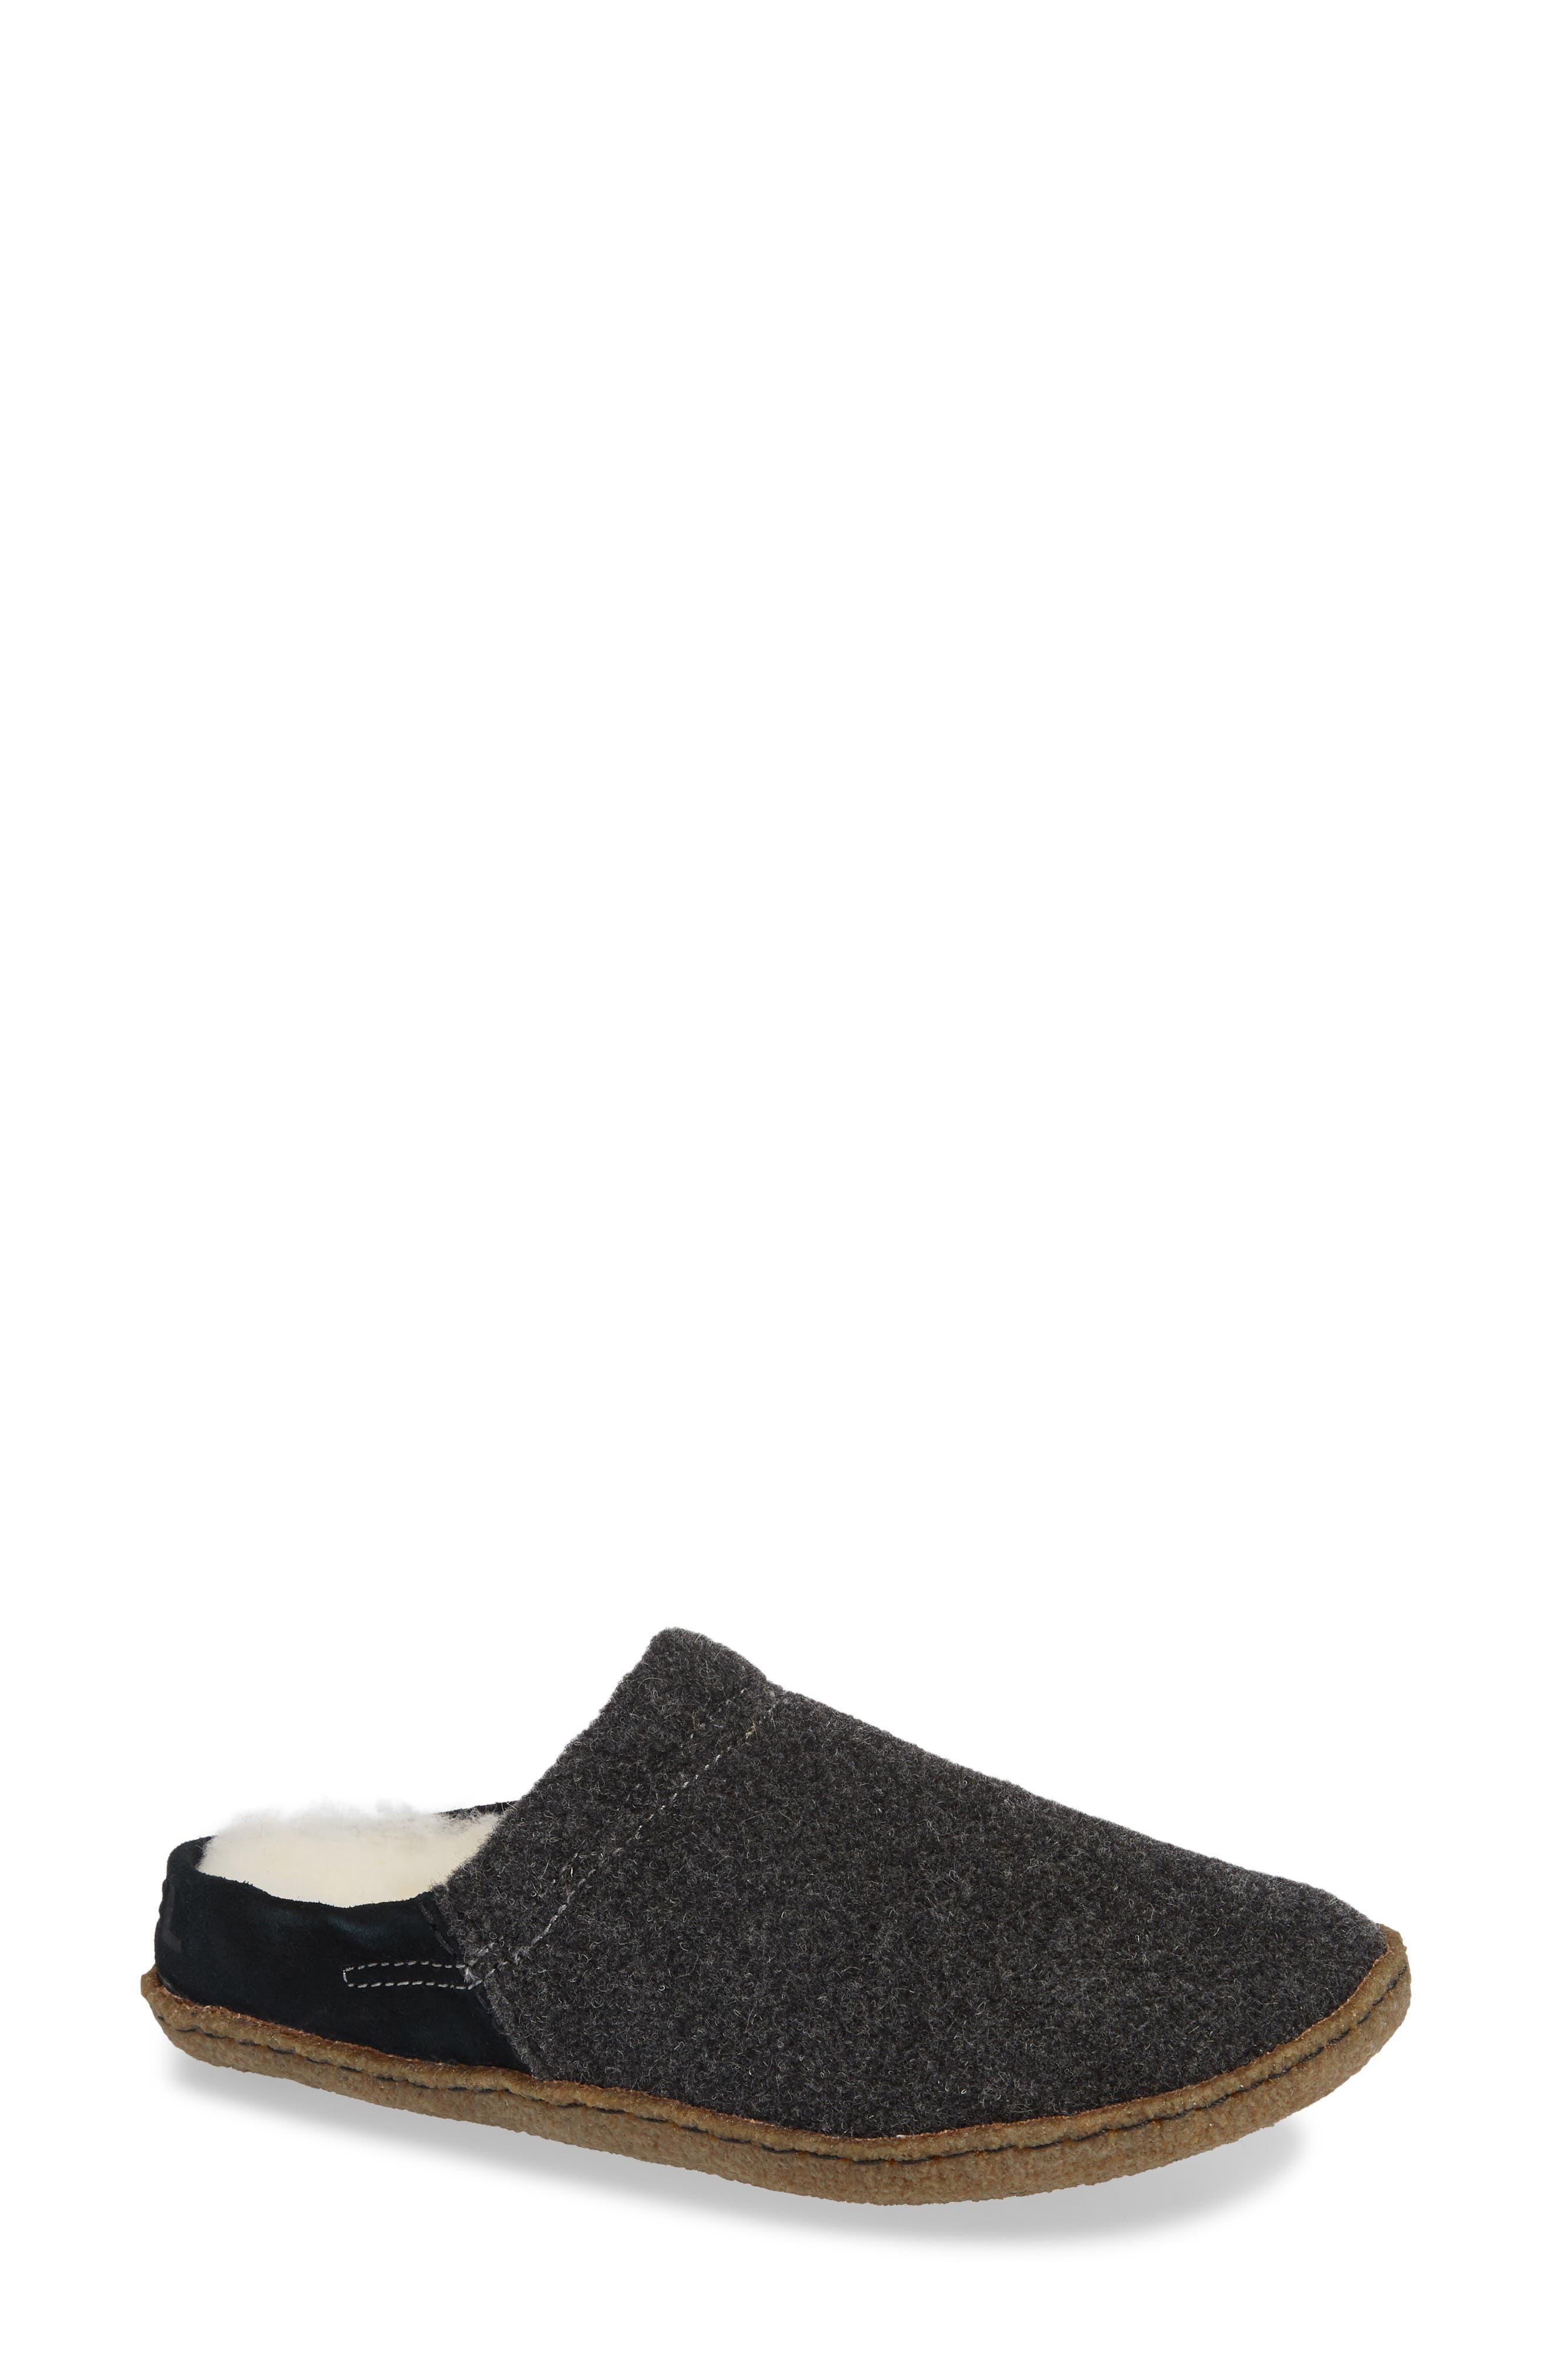 Nakiska Scuff Slipper, Main, color, BLACK/ NATURAL